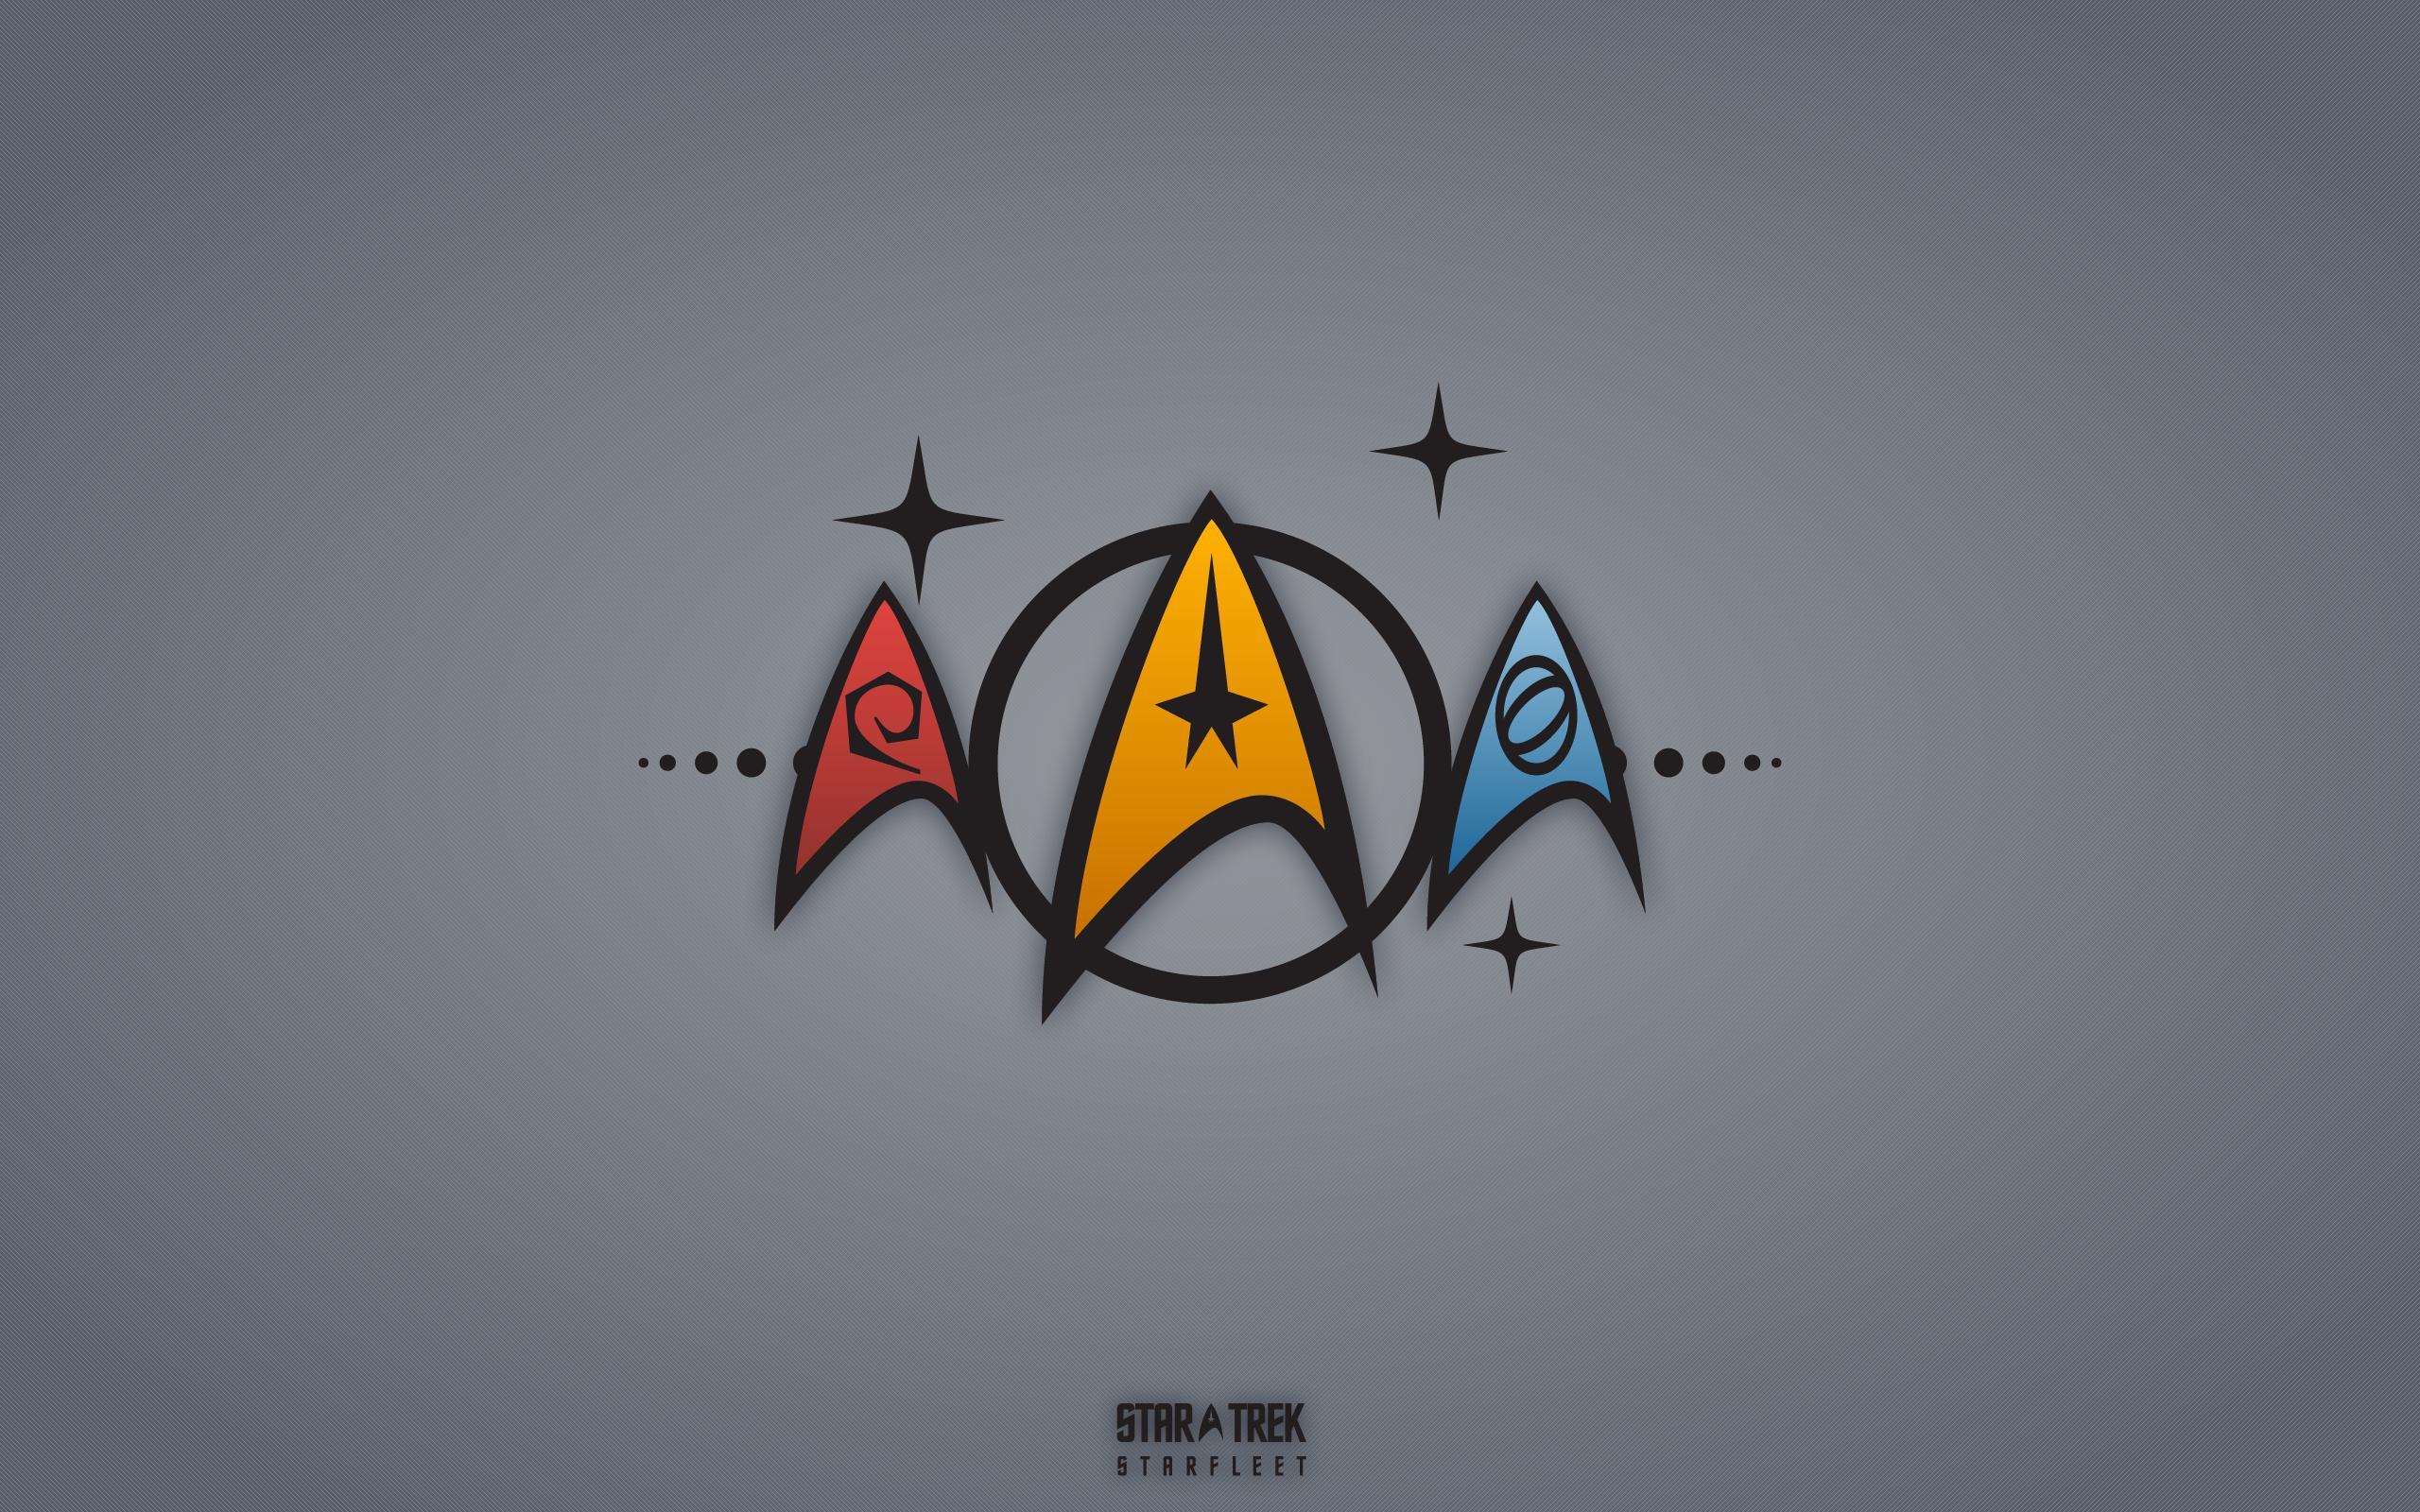 star trek tardis klingons doctor who crossovers wallpaper